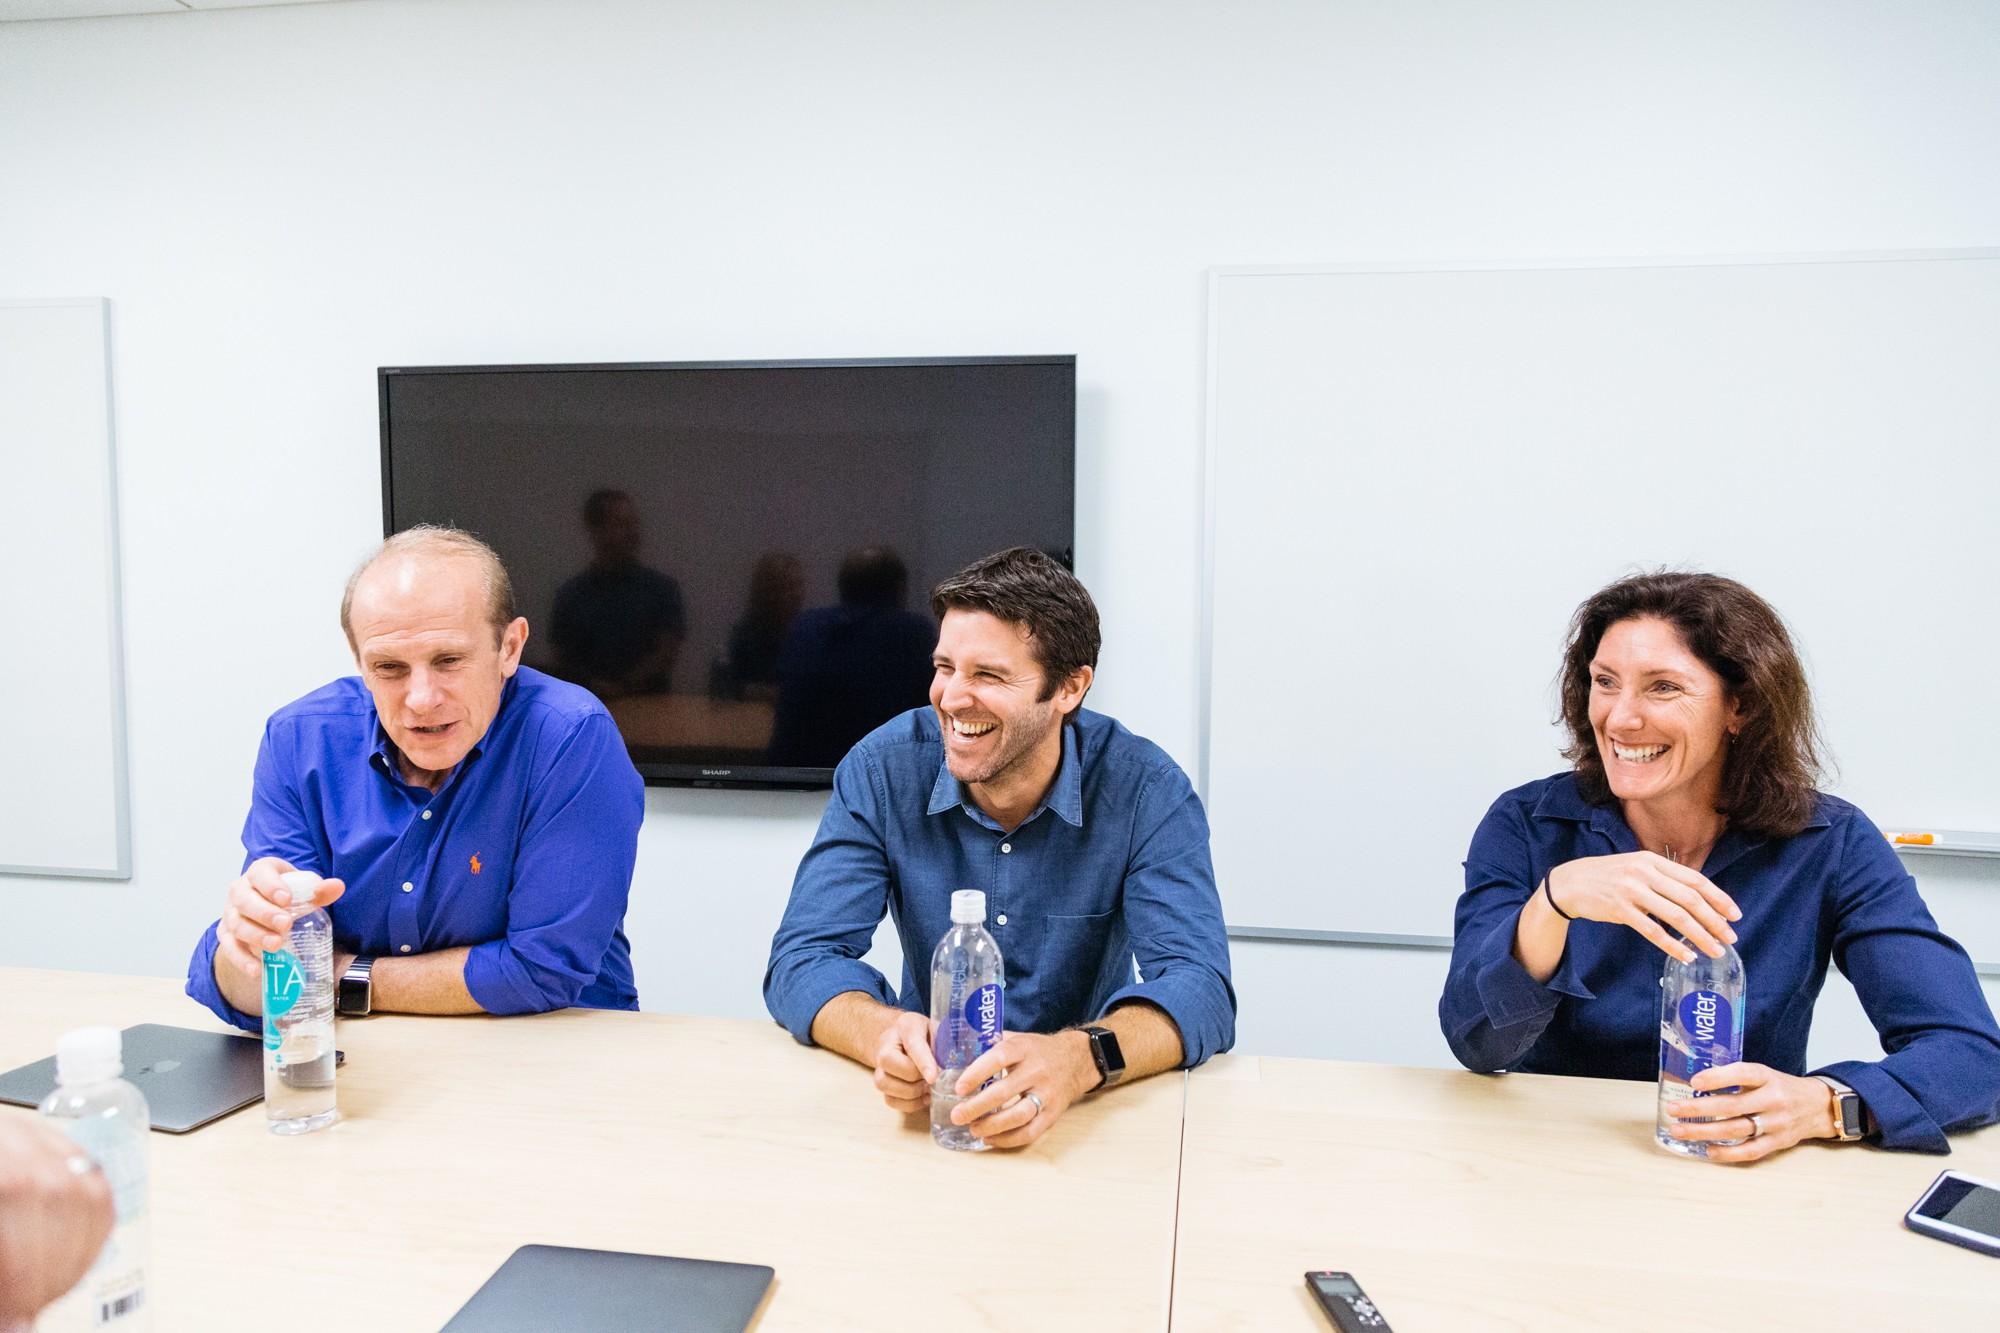 echipa design iMac 4K Apple